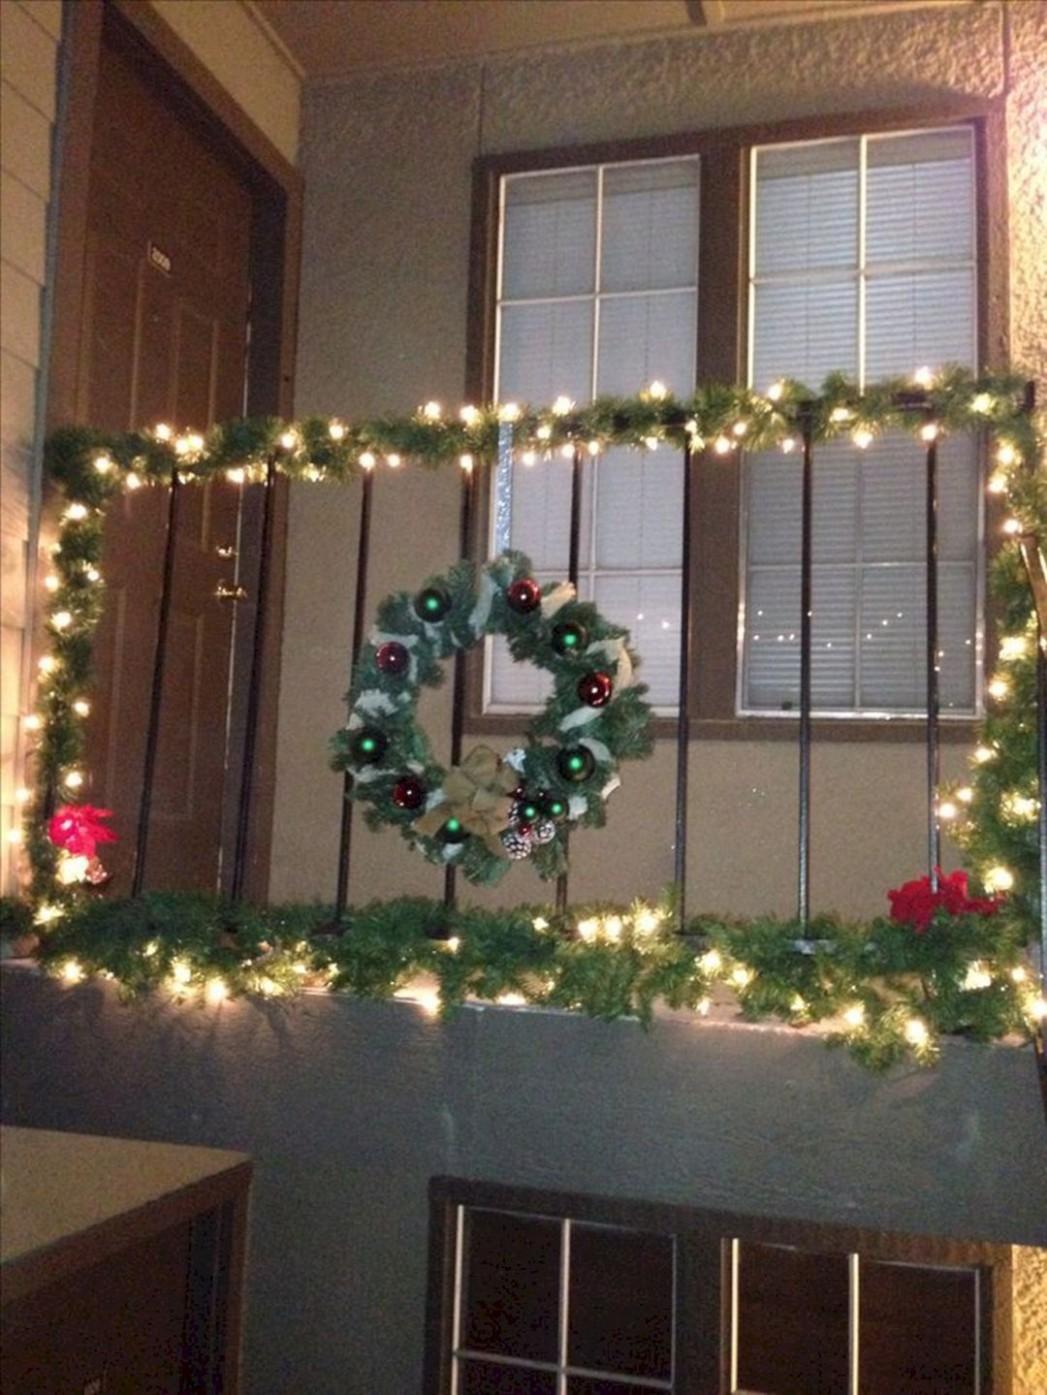 Apartment Balcony Christmas Light Decorating Idea11  Christmas  - Apartment Balcony Decorating Ideas Christmas